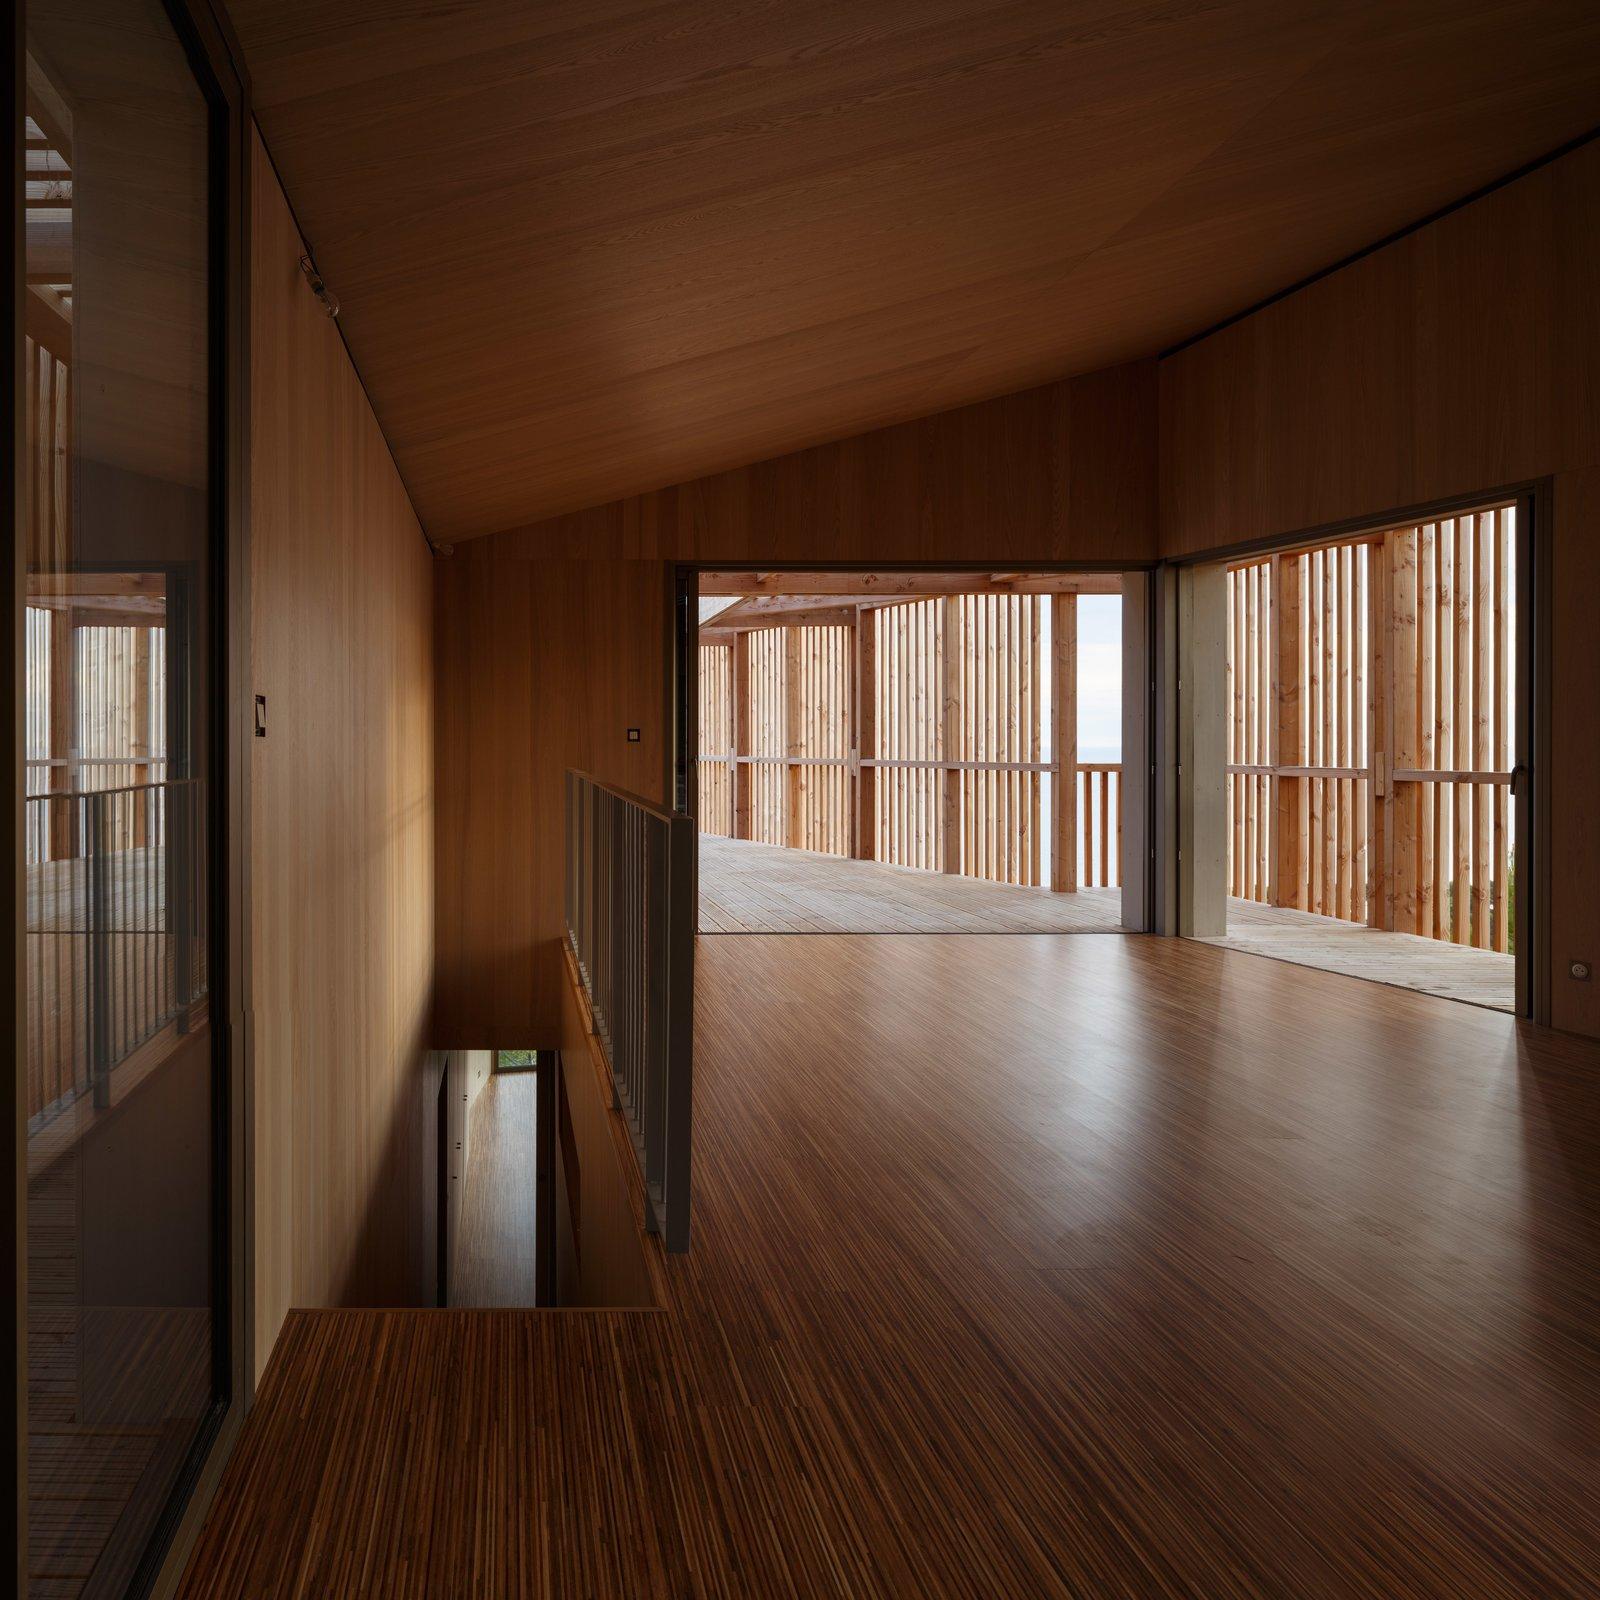 Living Room, Medium Hardwood Floor, and Wall Lighting  The KGET in Marseille